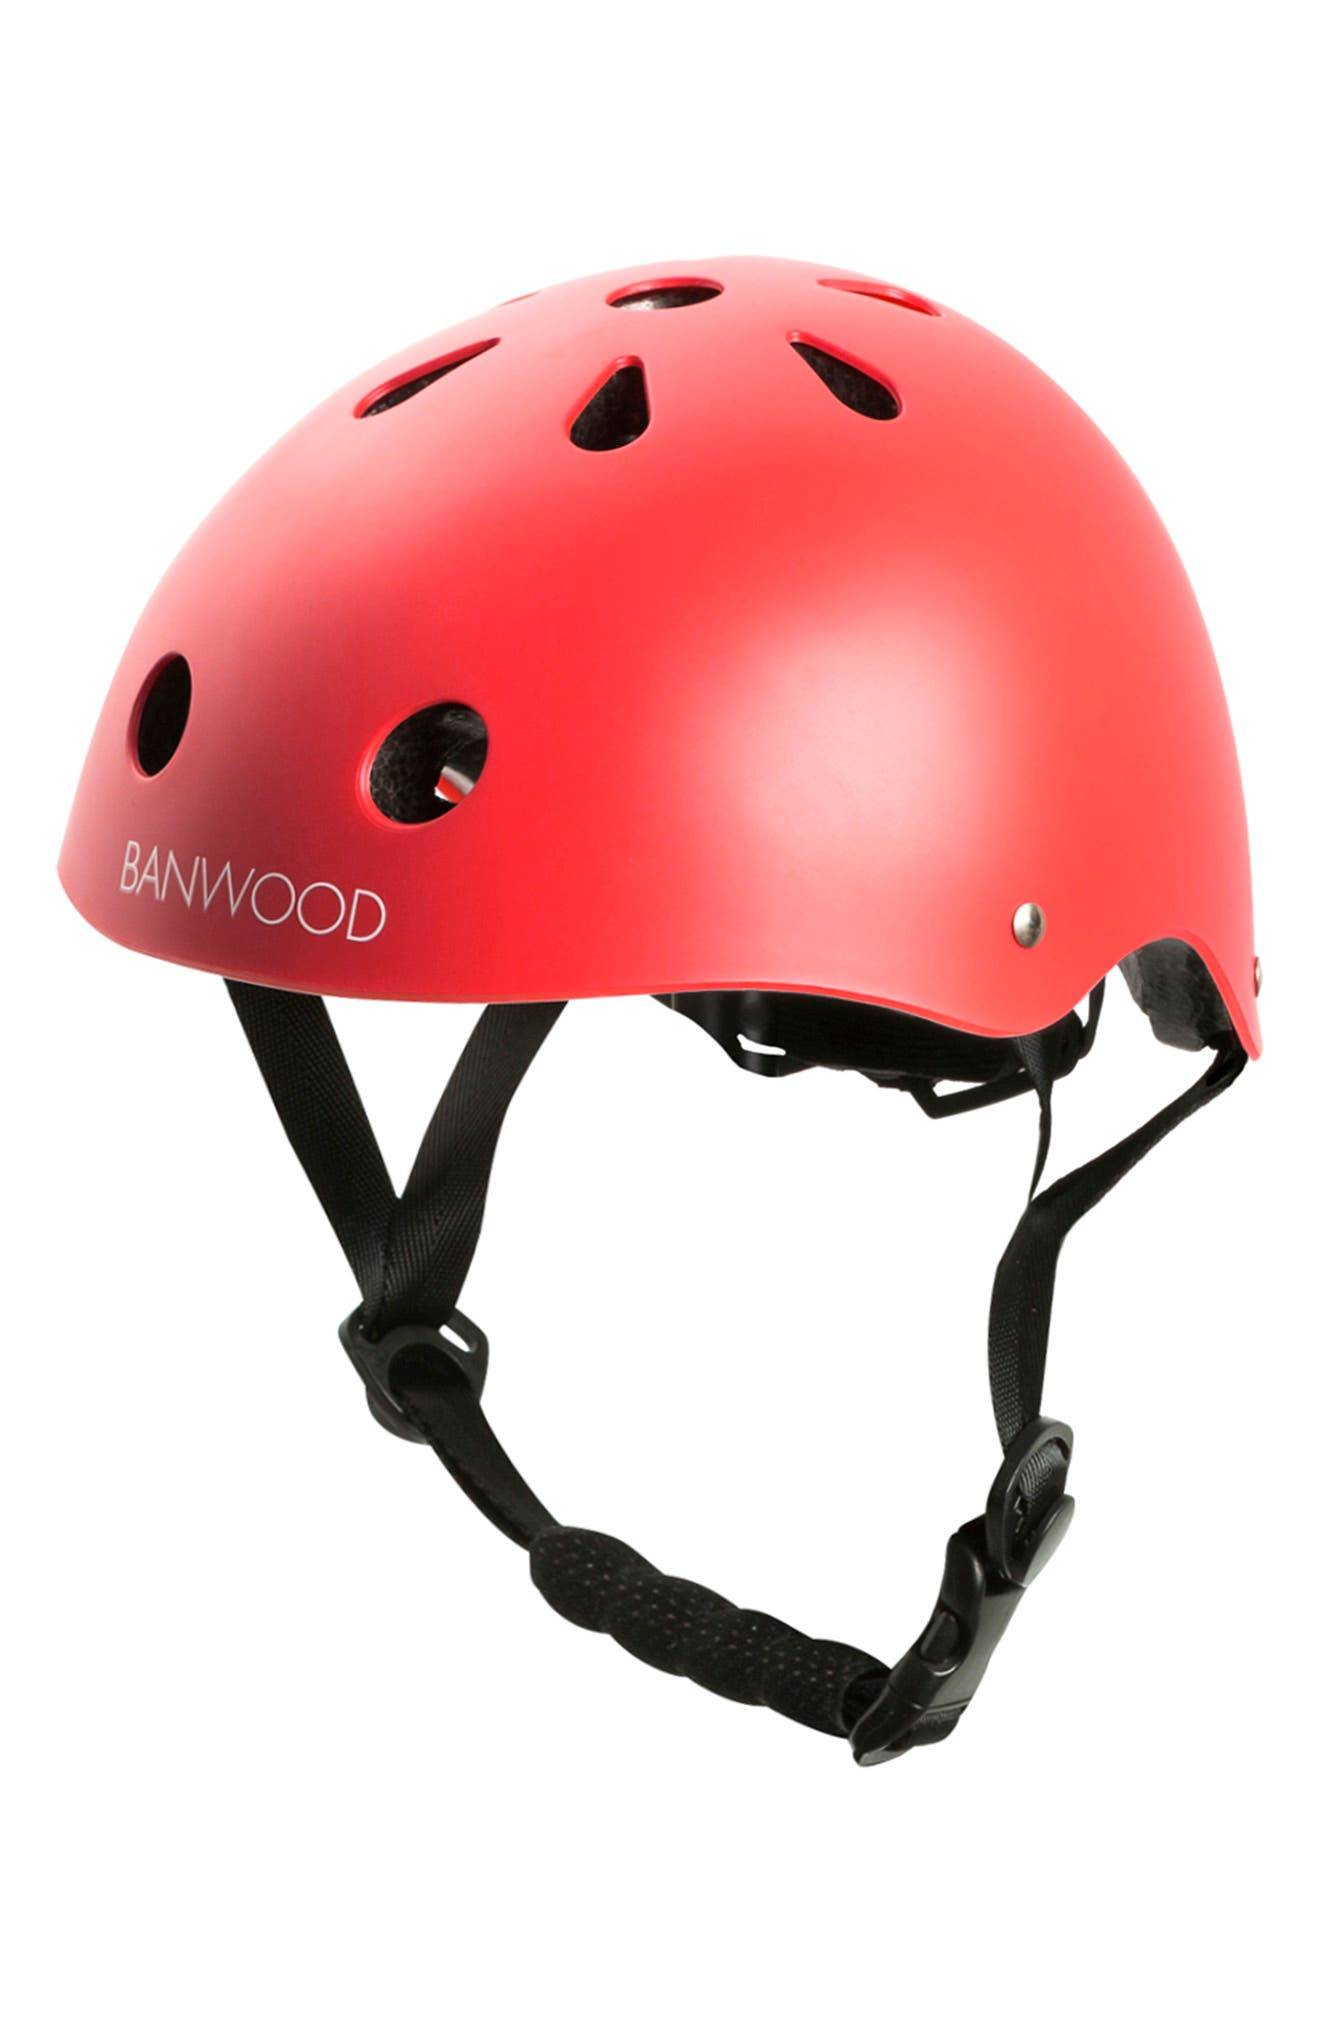 Banwood Bike Helmet - Red